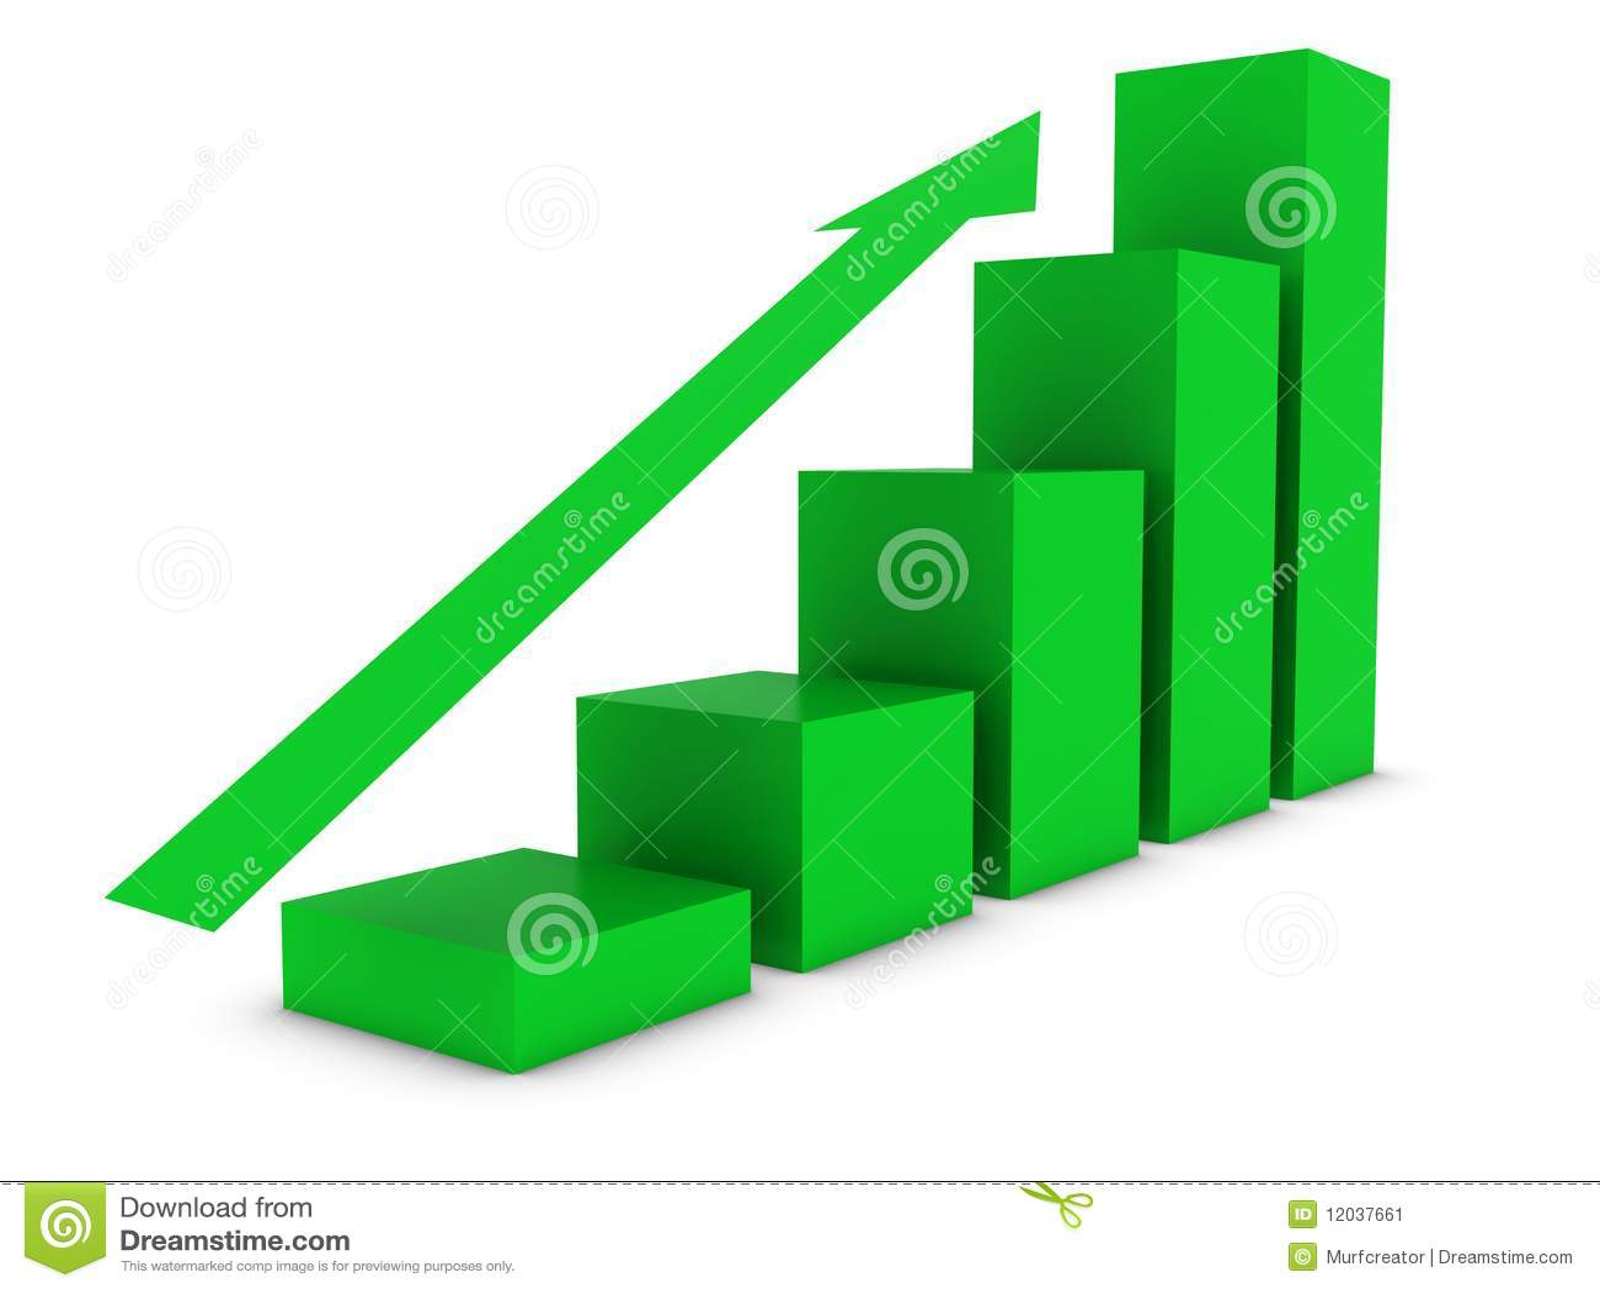 Ascending Bar Chart Stock Image